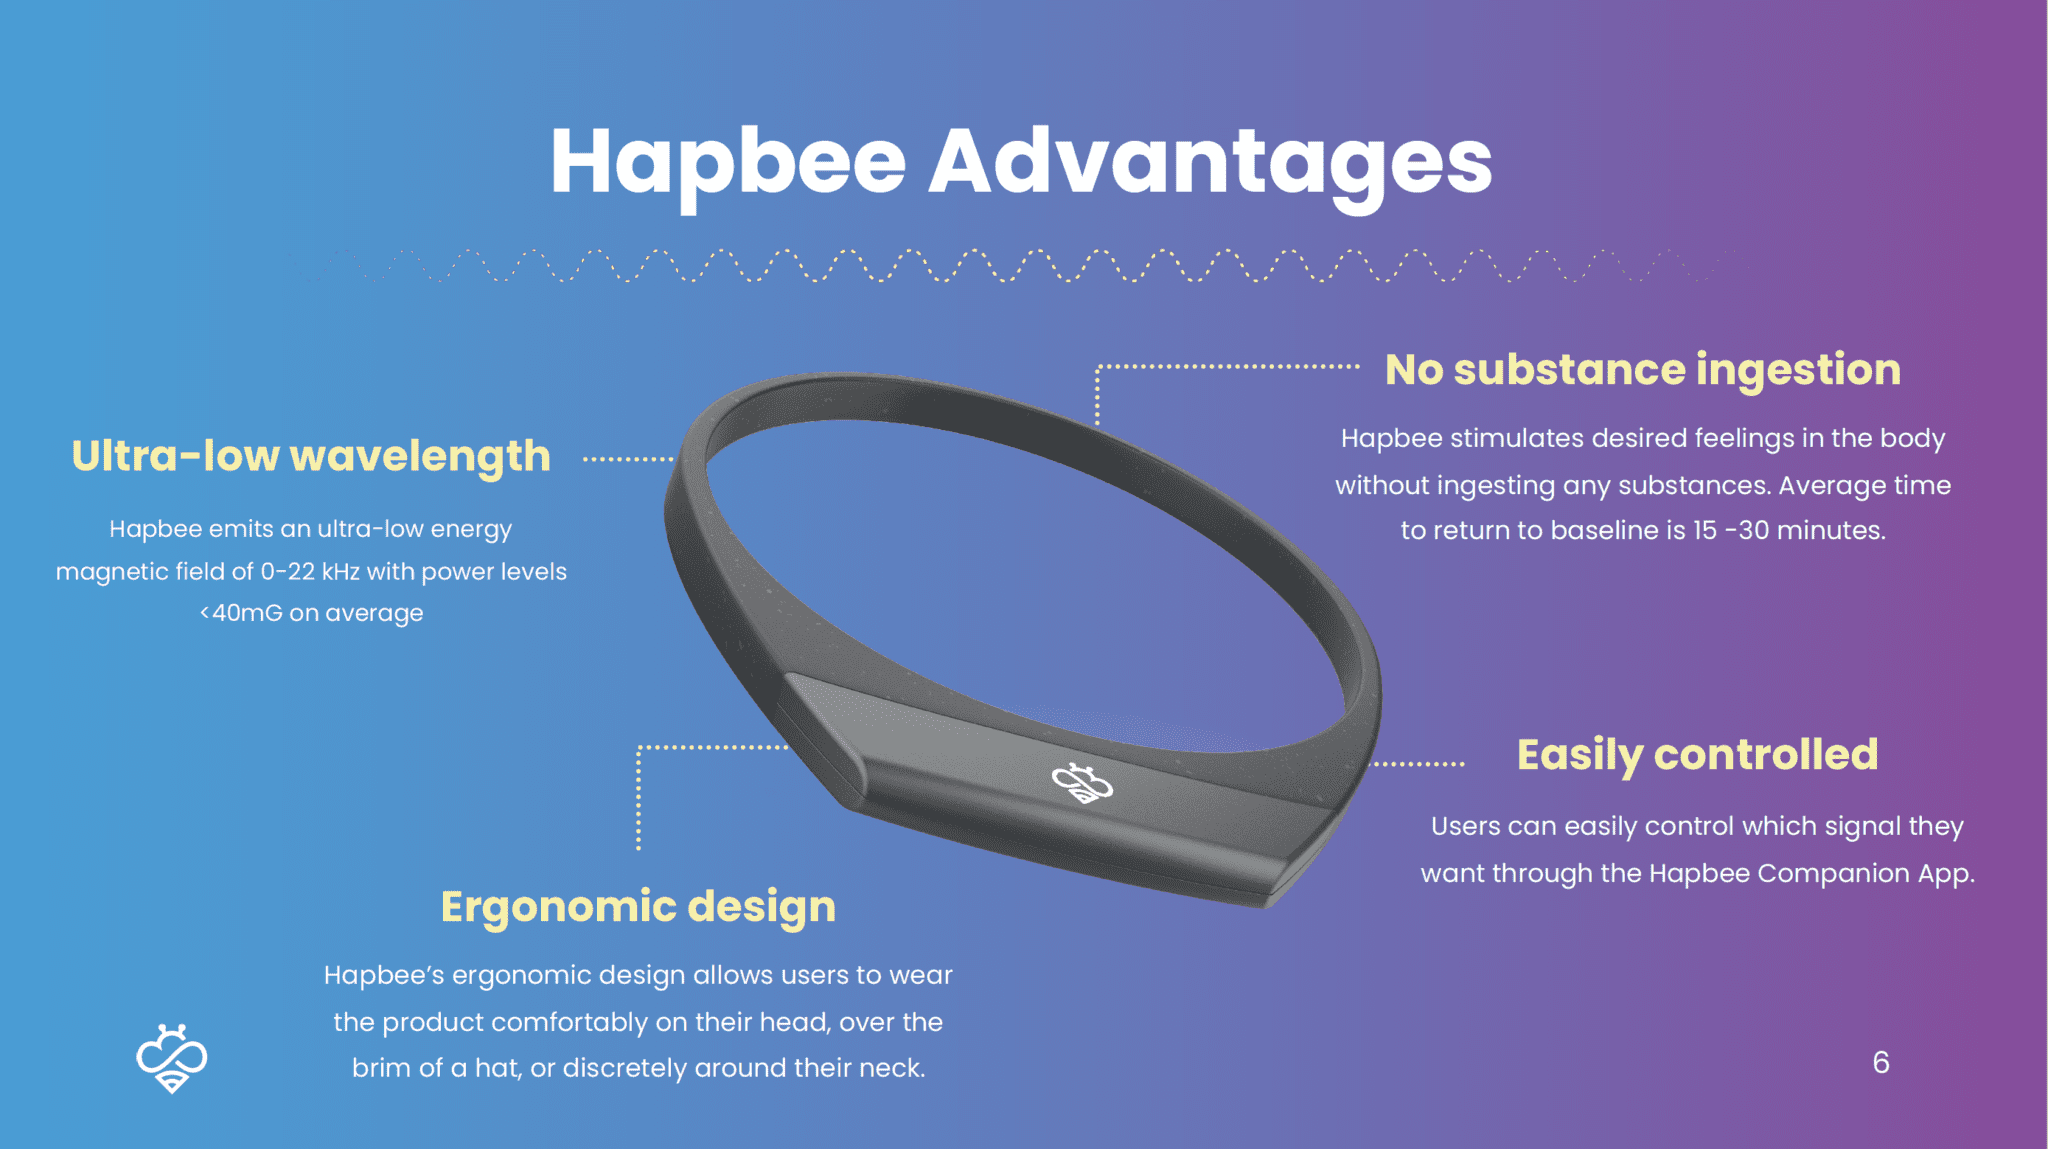 Hapbee Advantages